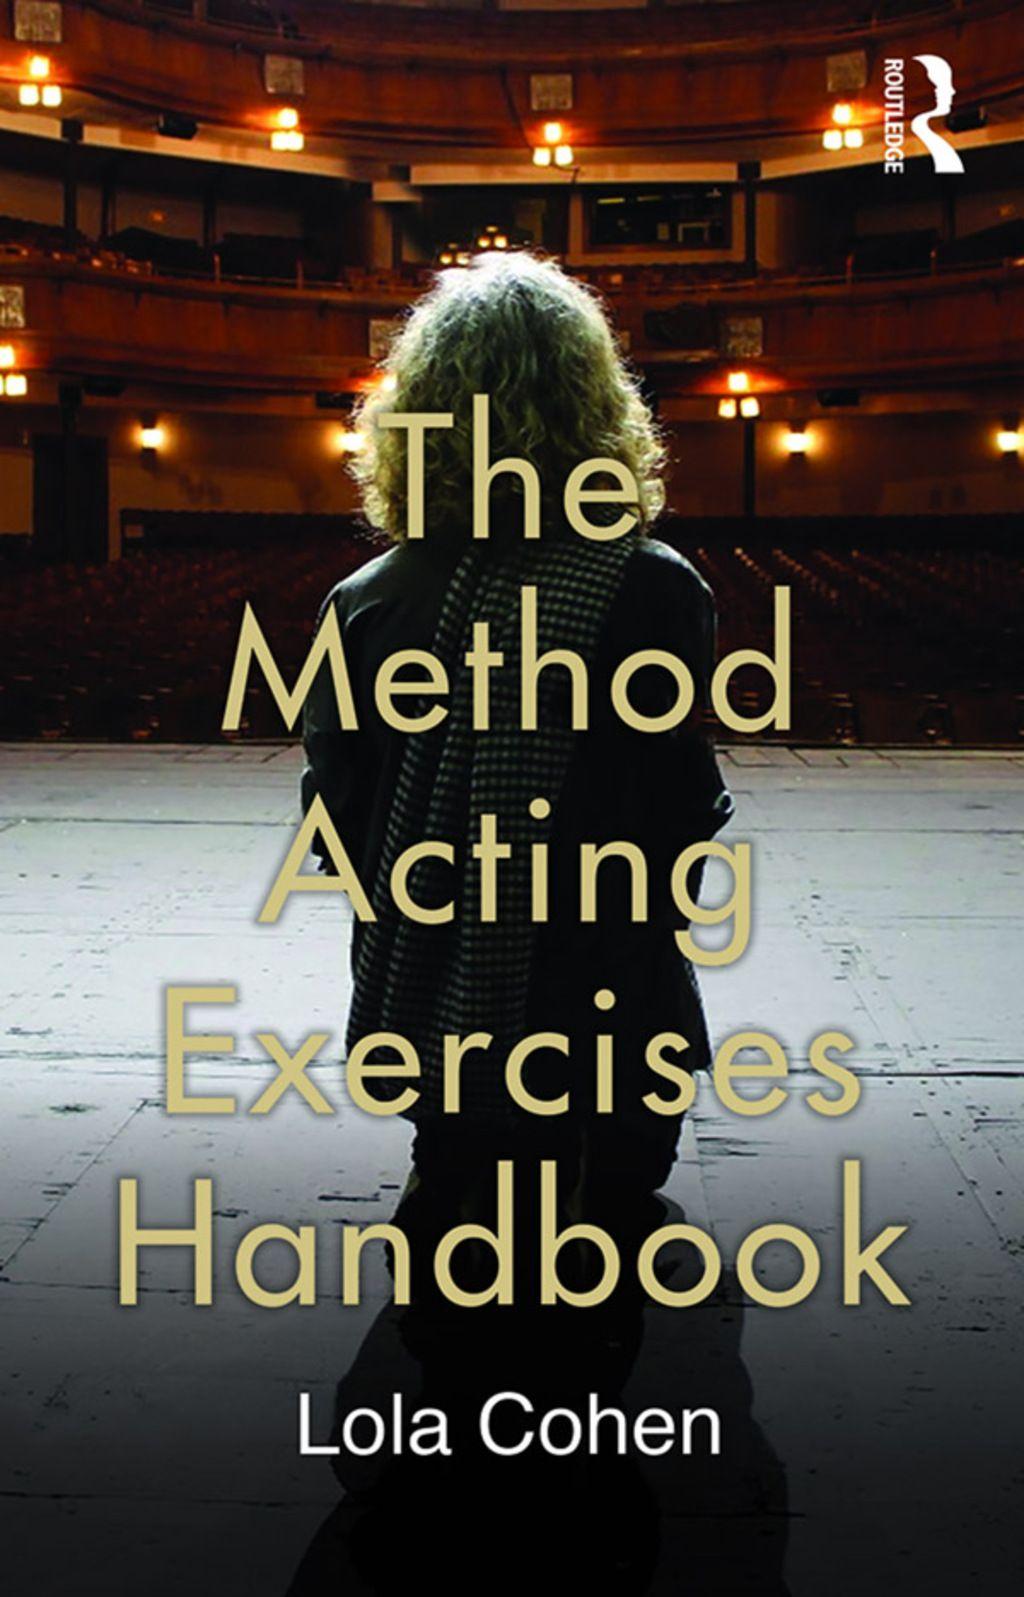 The Method Acting Exercises Handbook (eBook Rental) in 2019